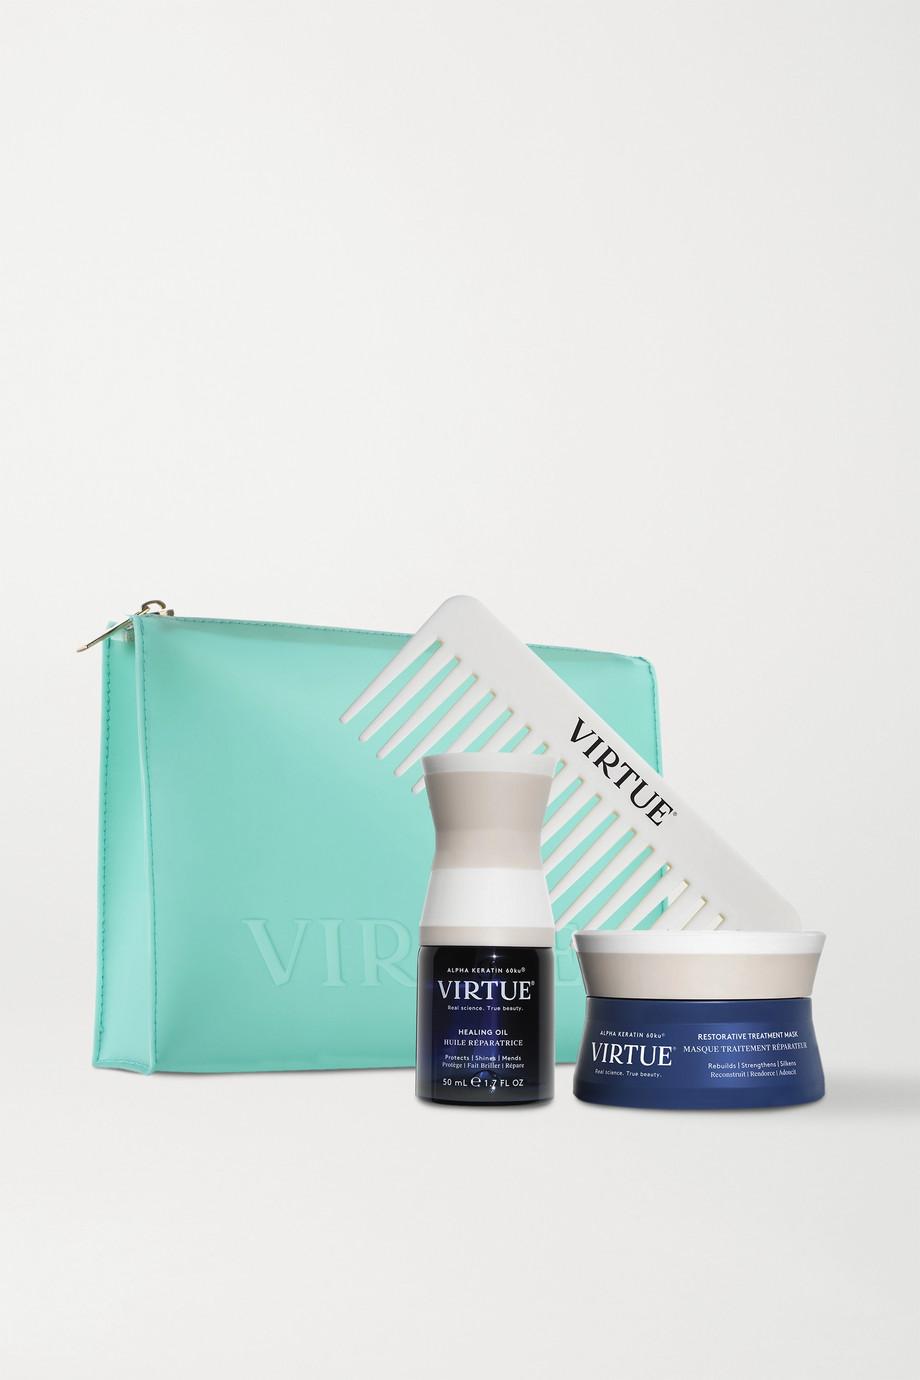 Virtue Spring Treatment Kit